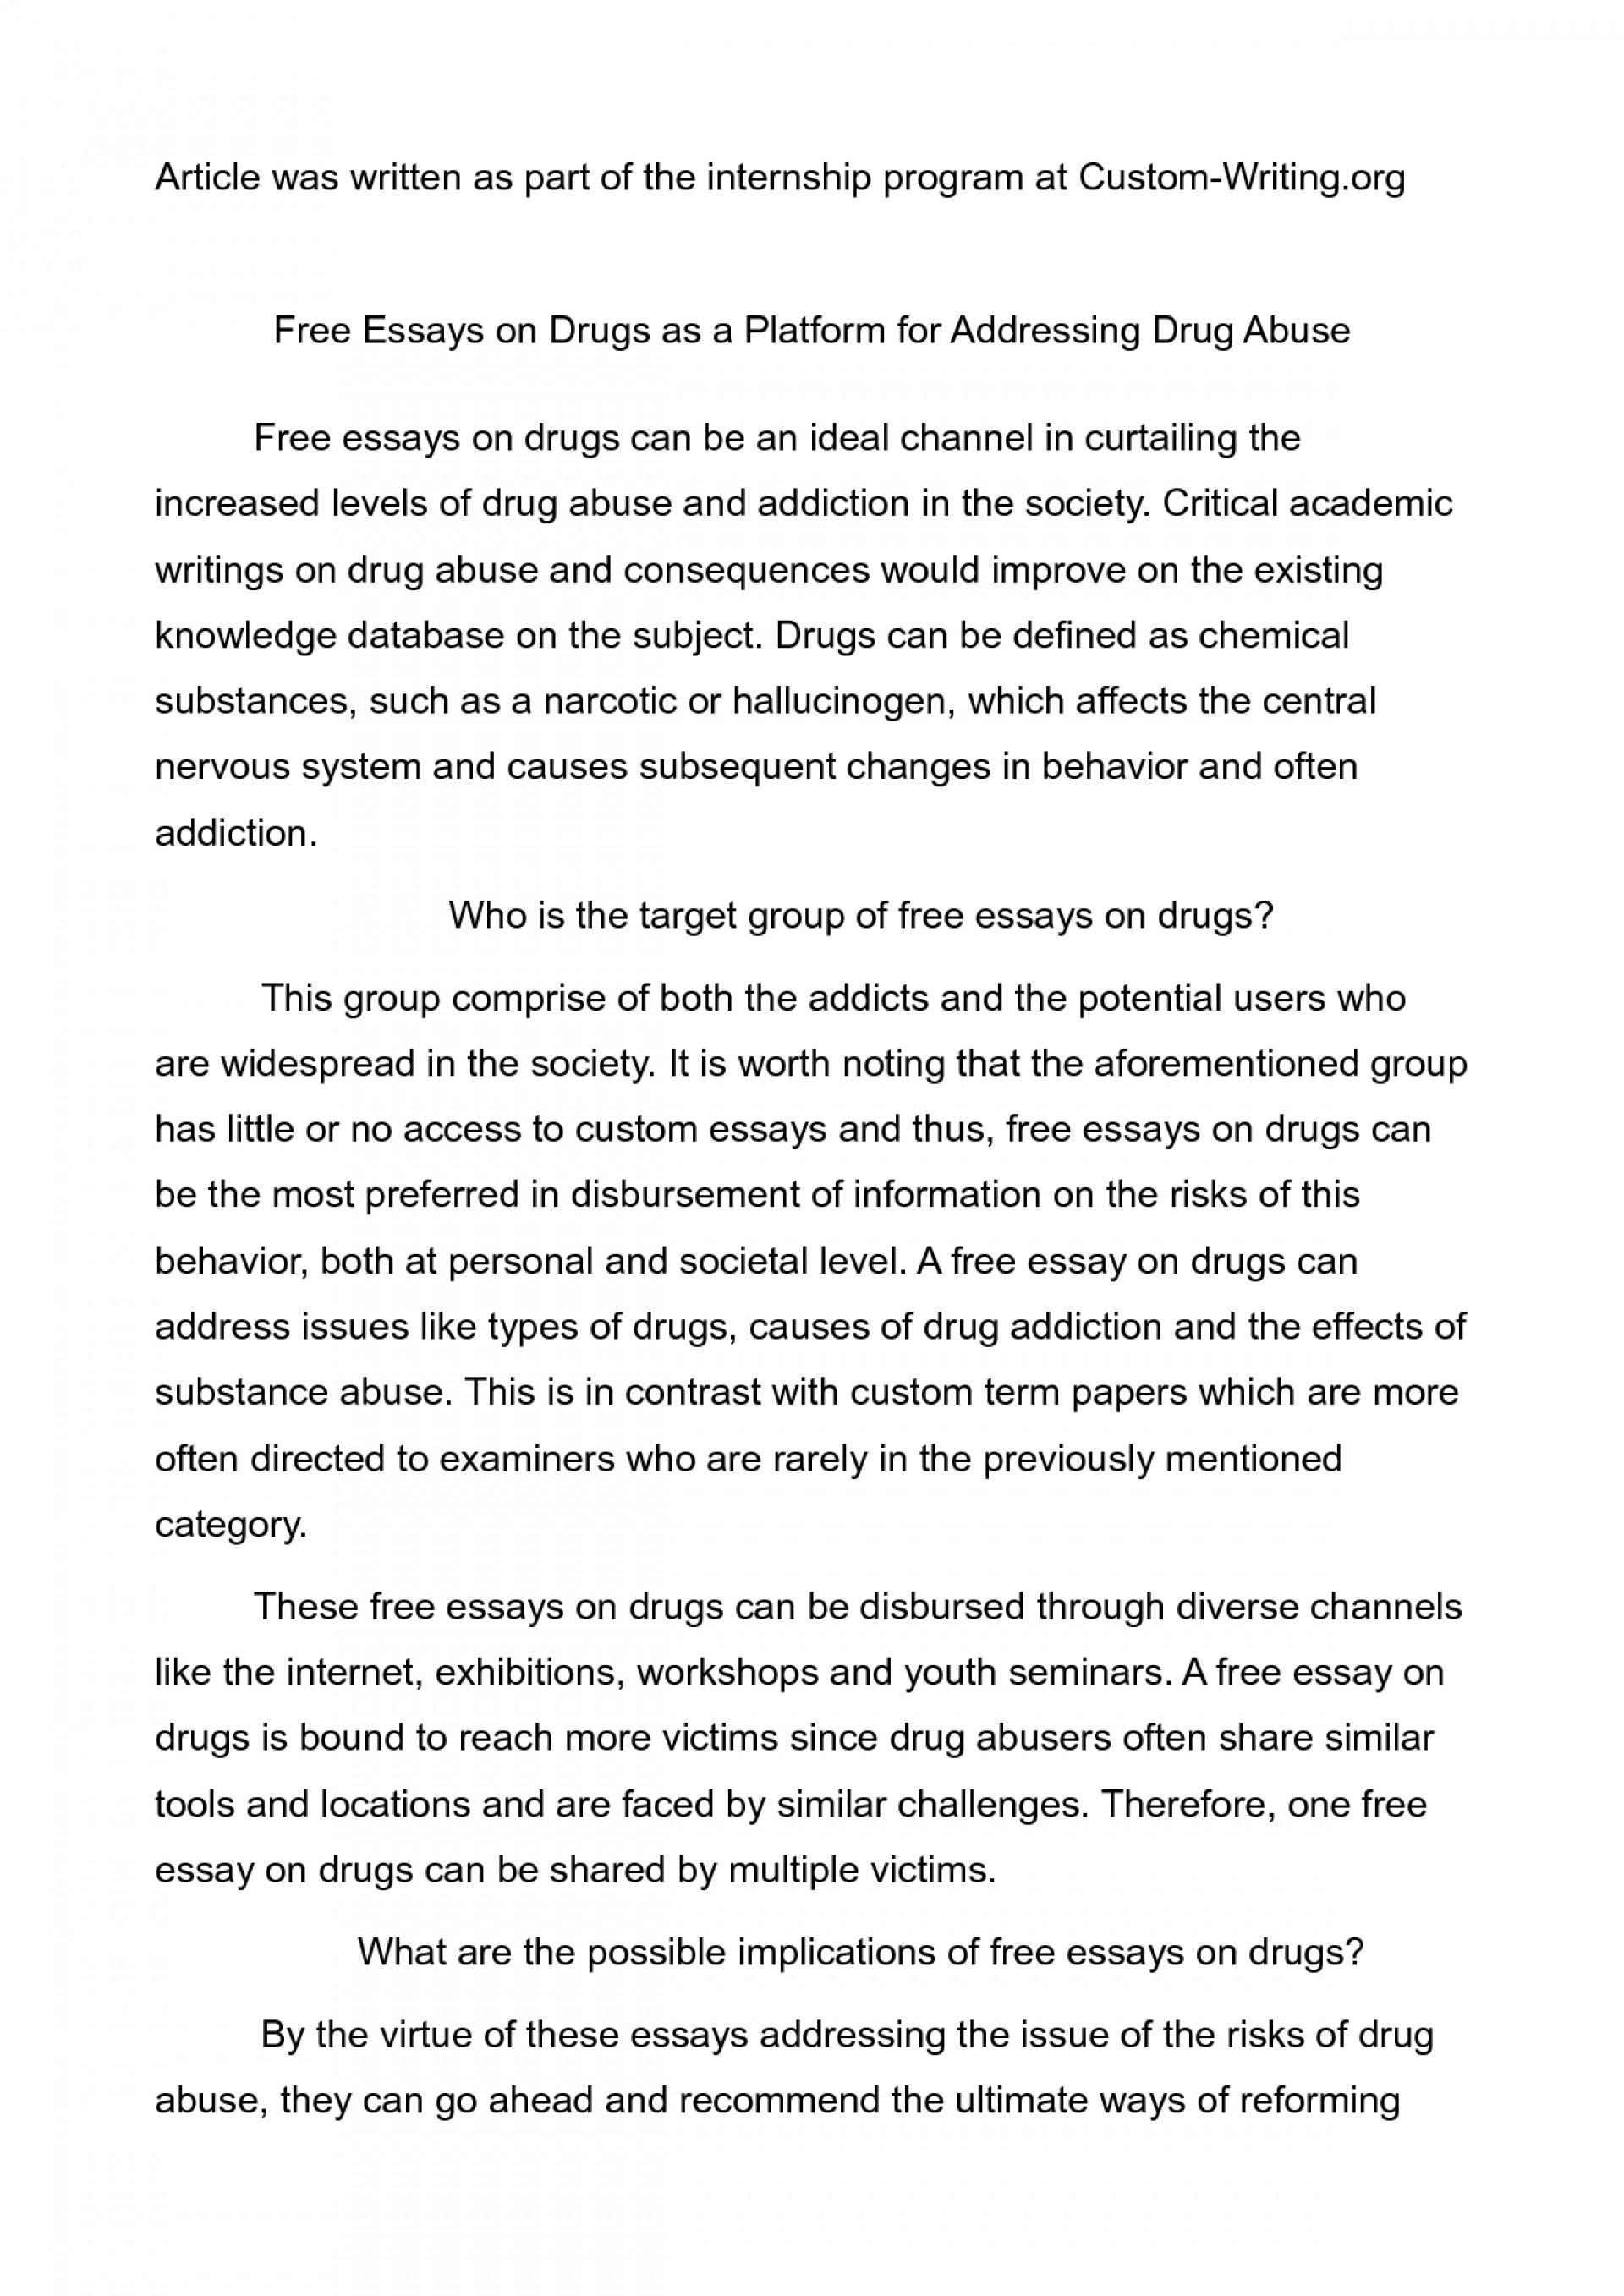 001 Essays About Drugs Essay Stirring Short Tagalog Persuasive Illegal Argumentative Addiction 1920